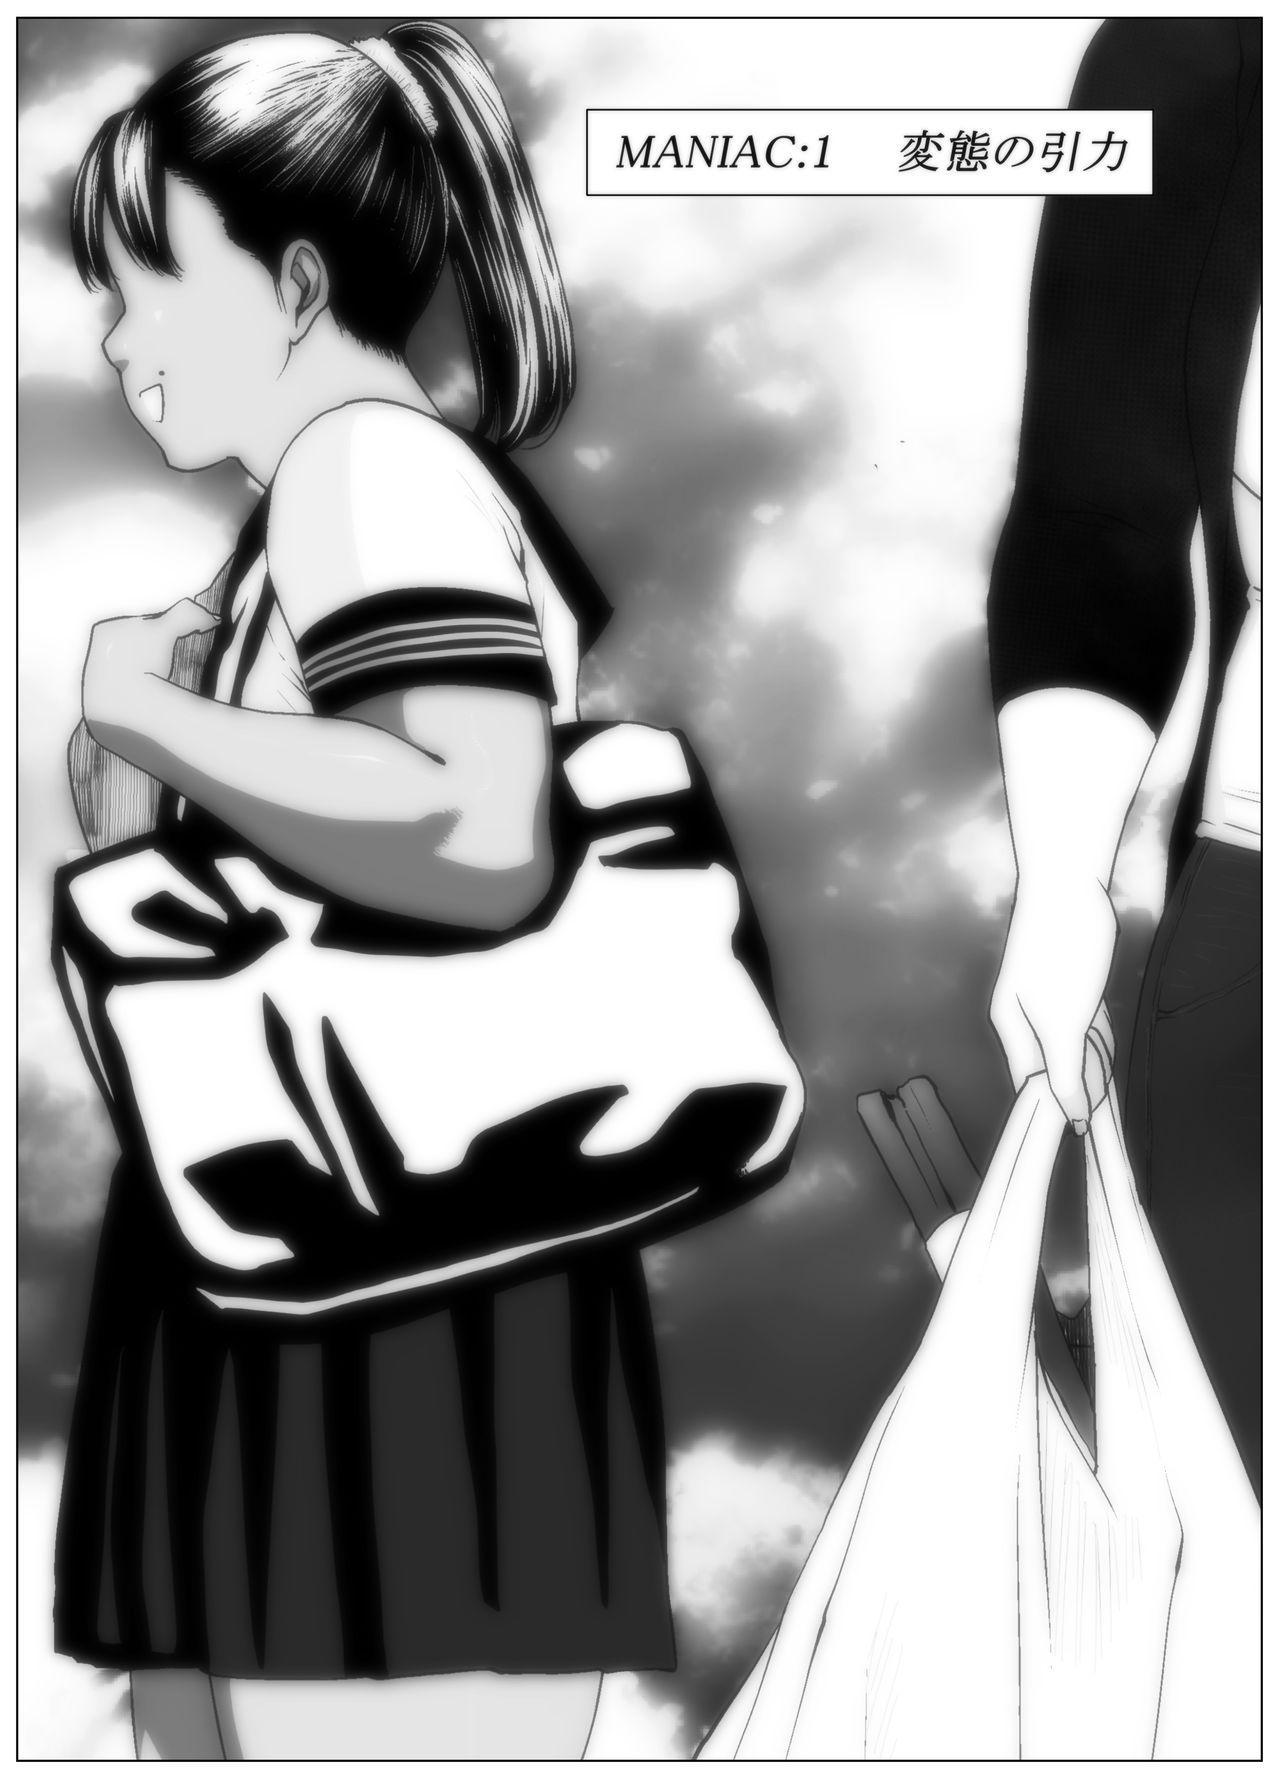 Koufukuron - Murase Ayumi Hen MANIAC: 1 4